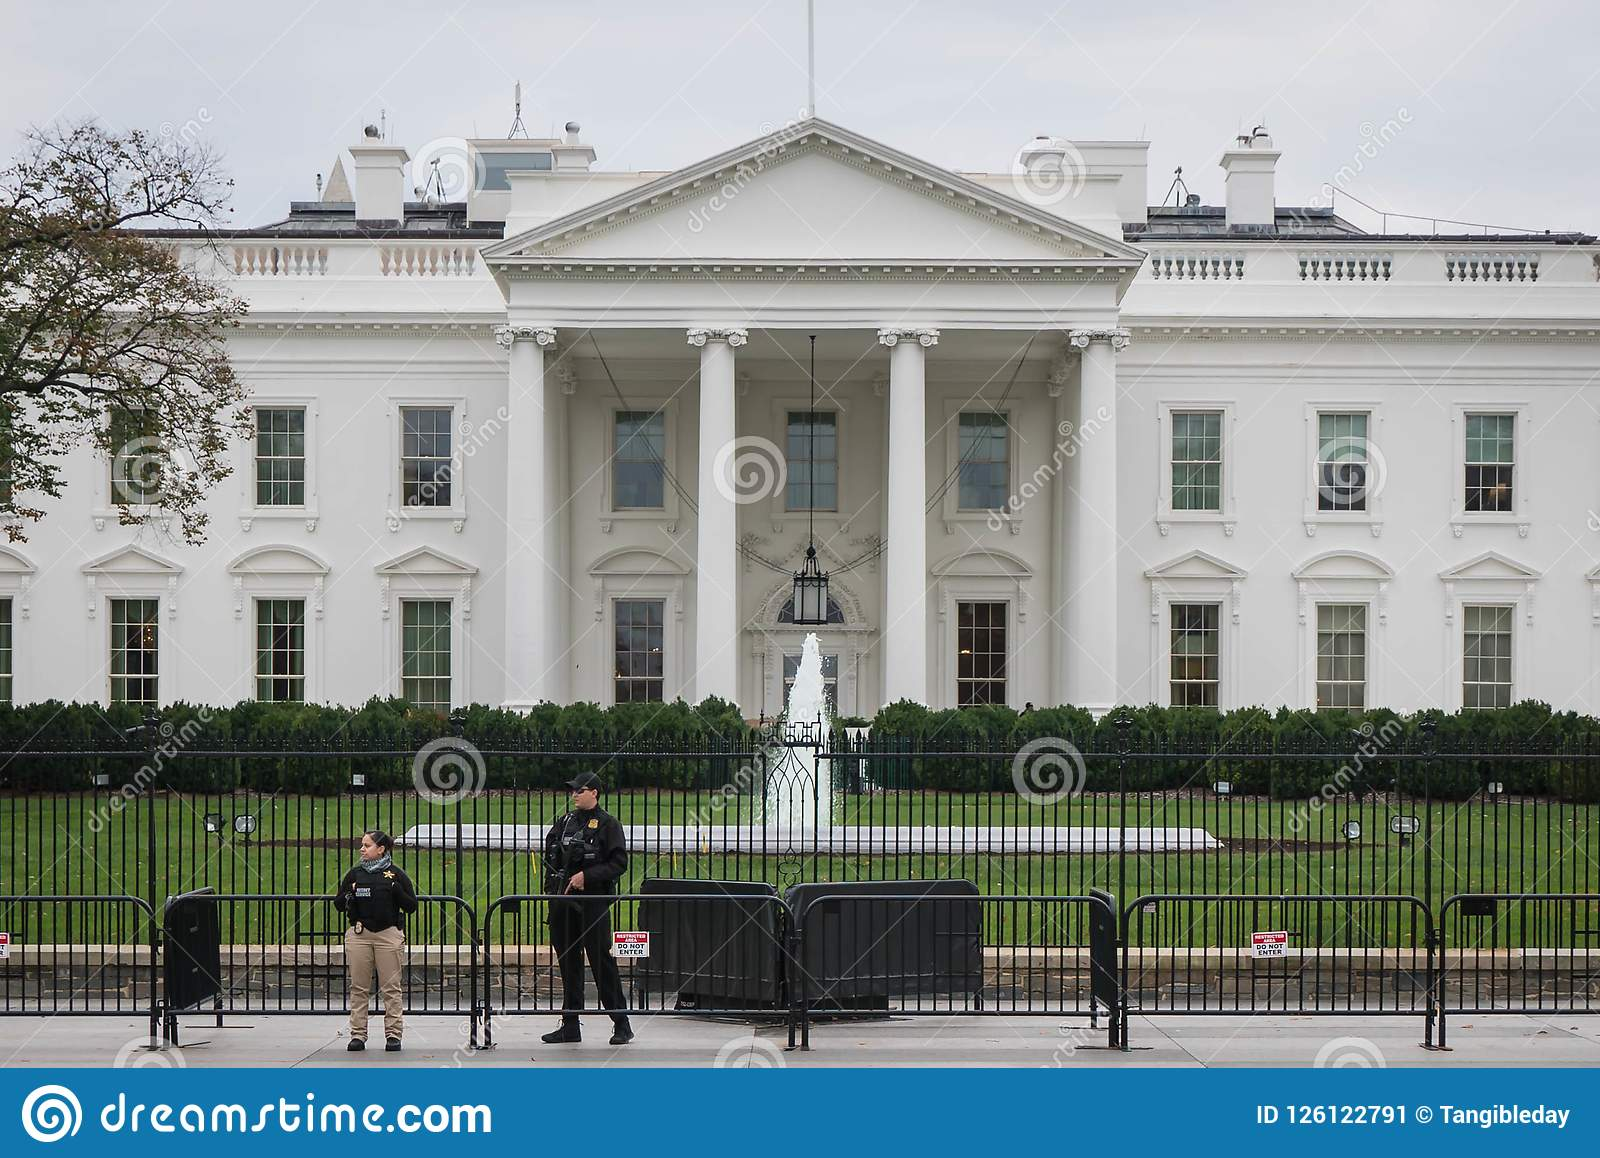 White house border security, overcast